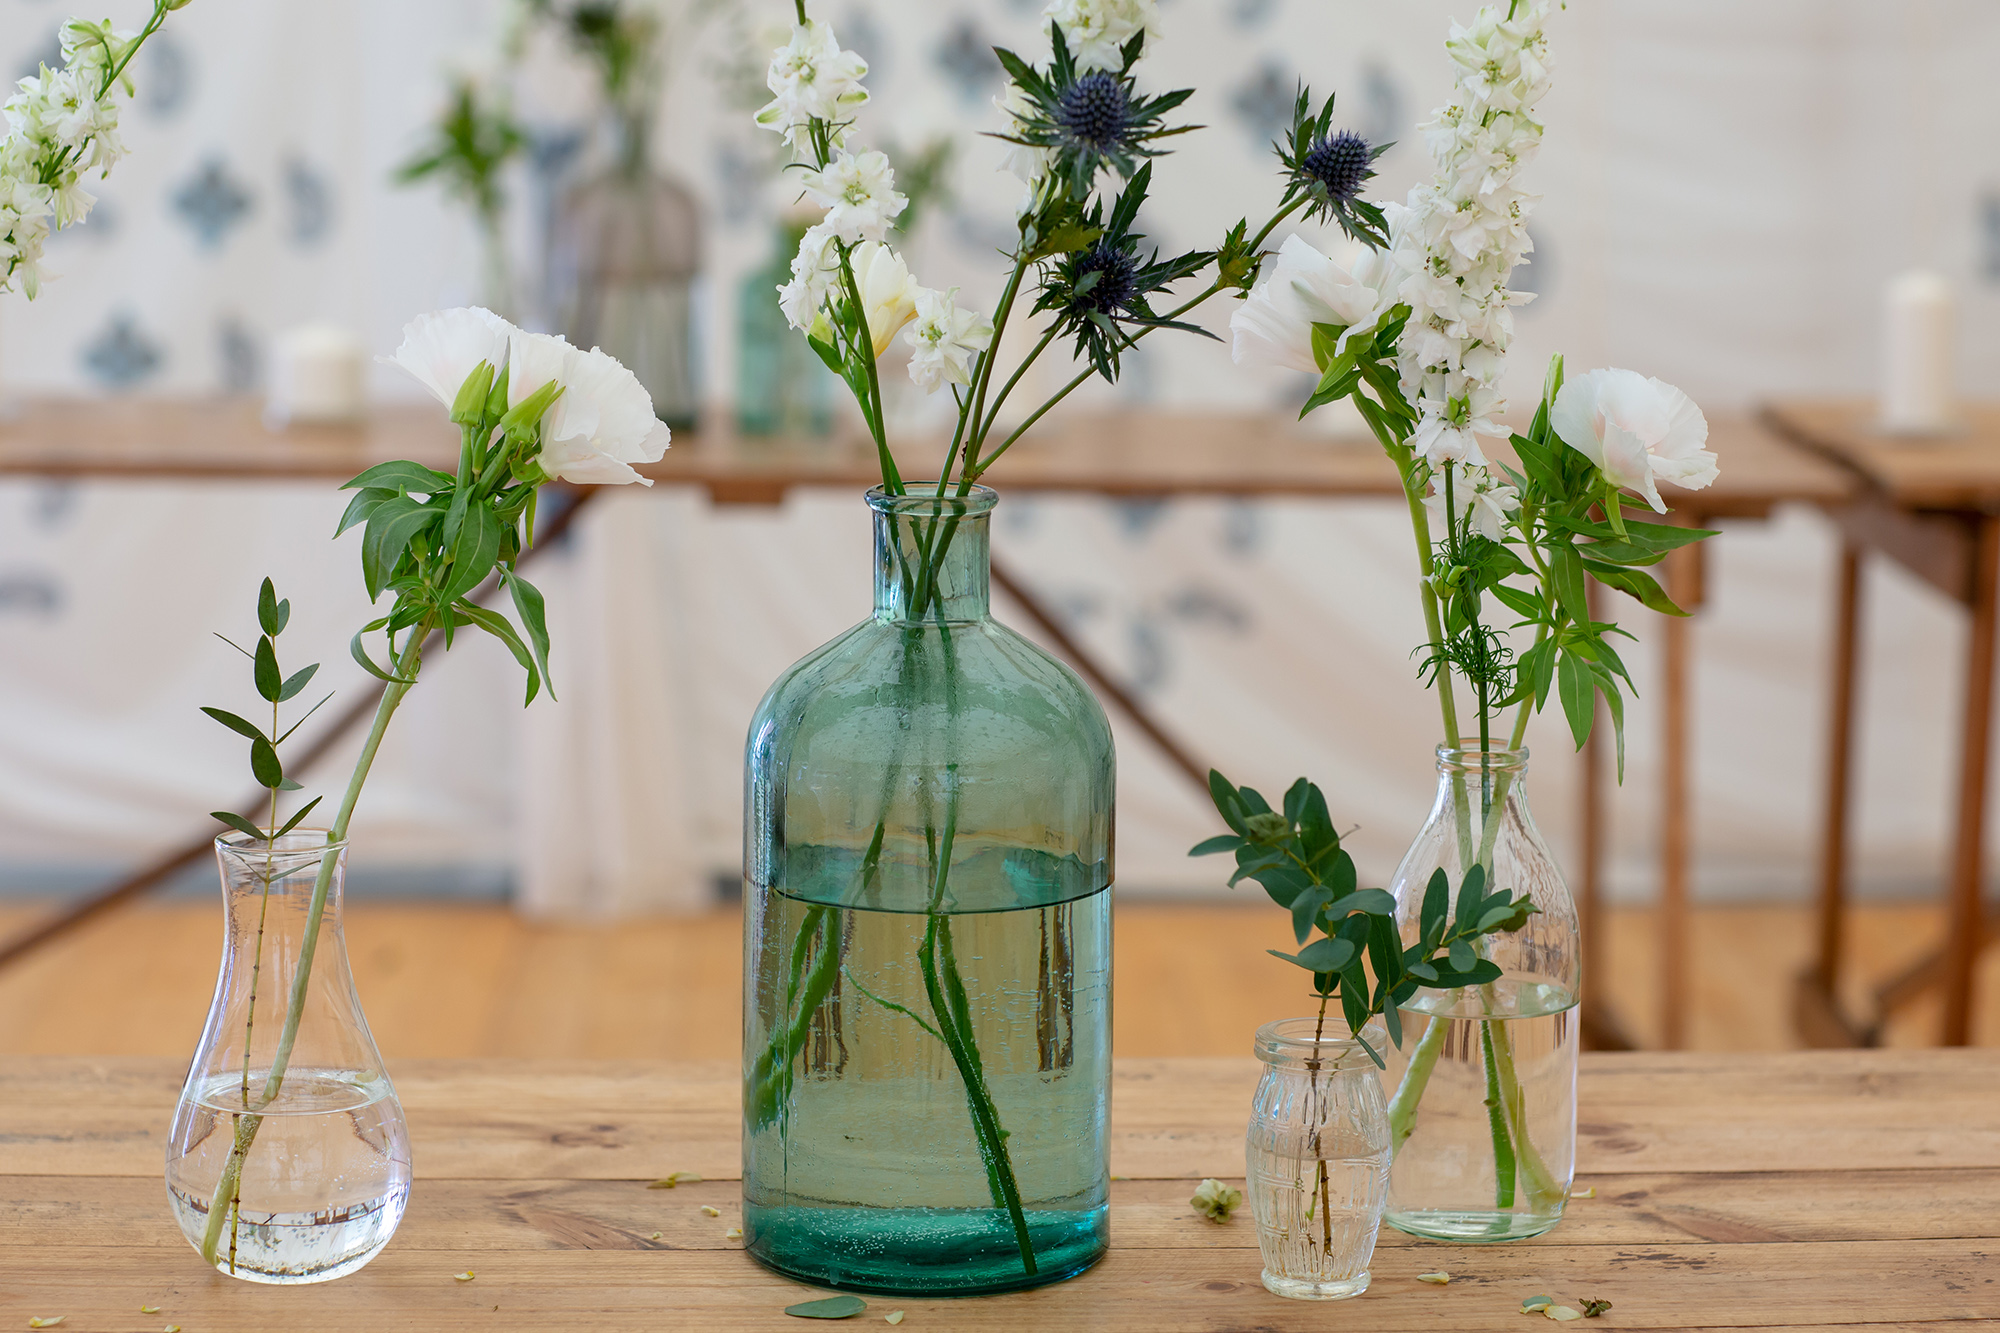 chichester_wedding_photographer_london_juliatoms_044.jpg